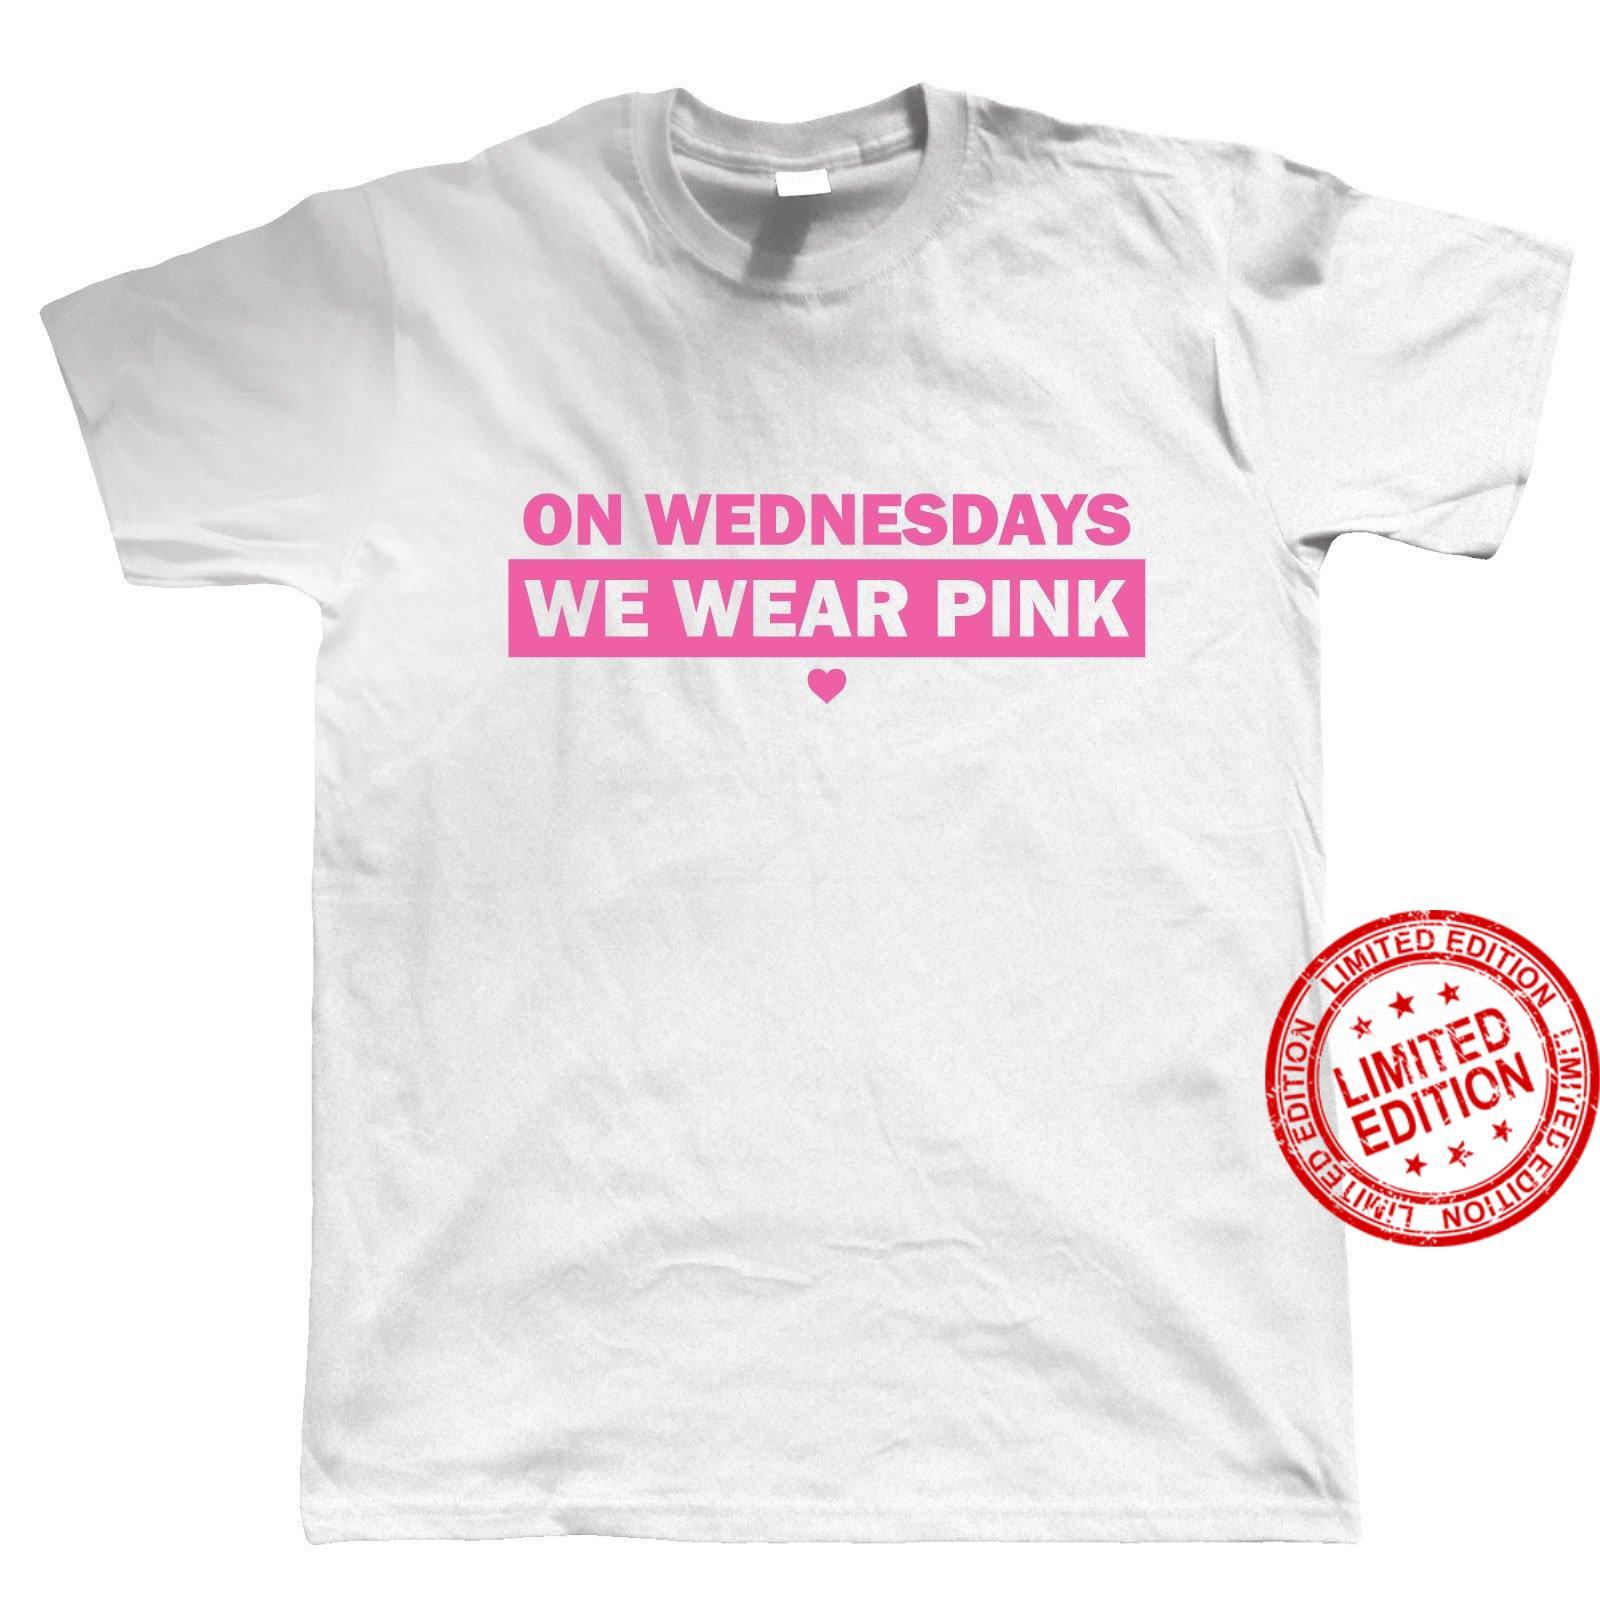 On Wednesdays We Wear Pink Mens - Mean Girls Chick Flicks Movie Shirt